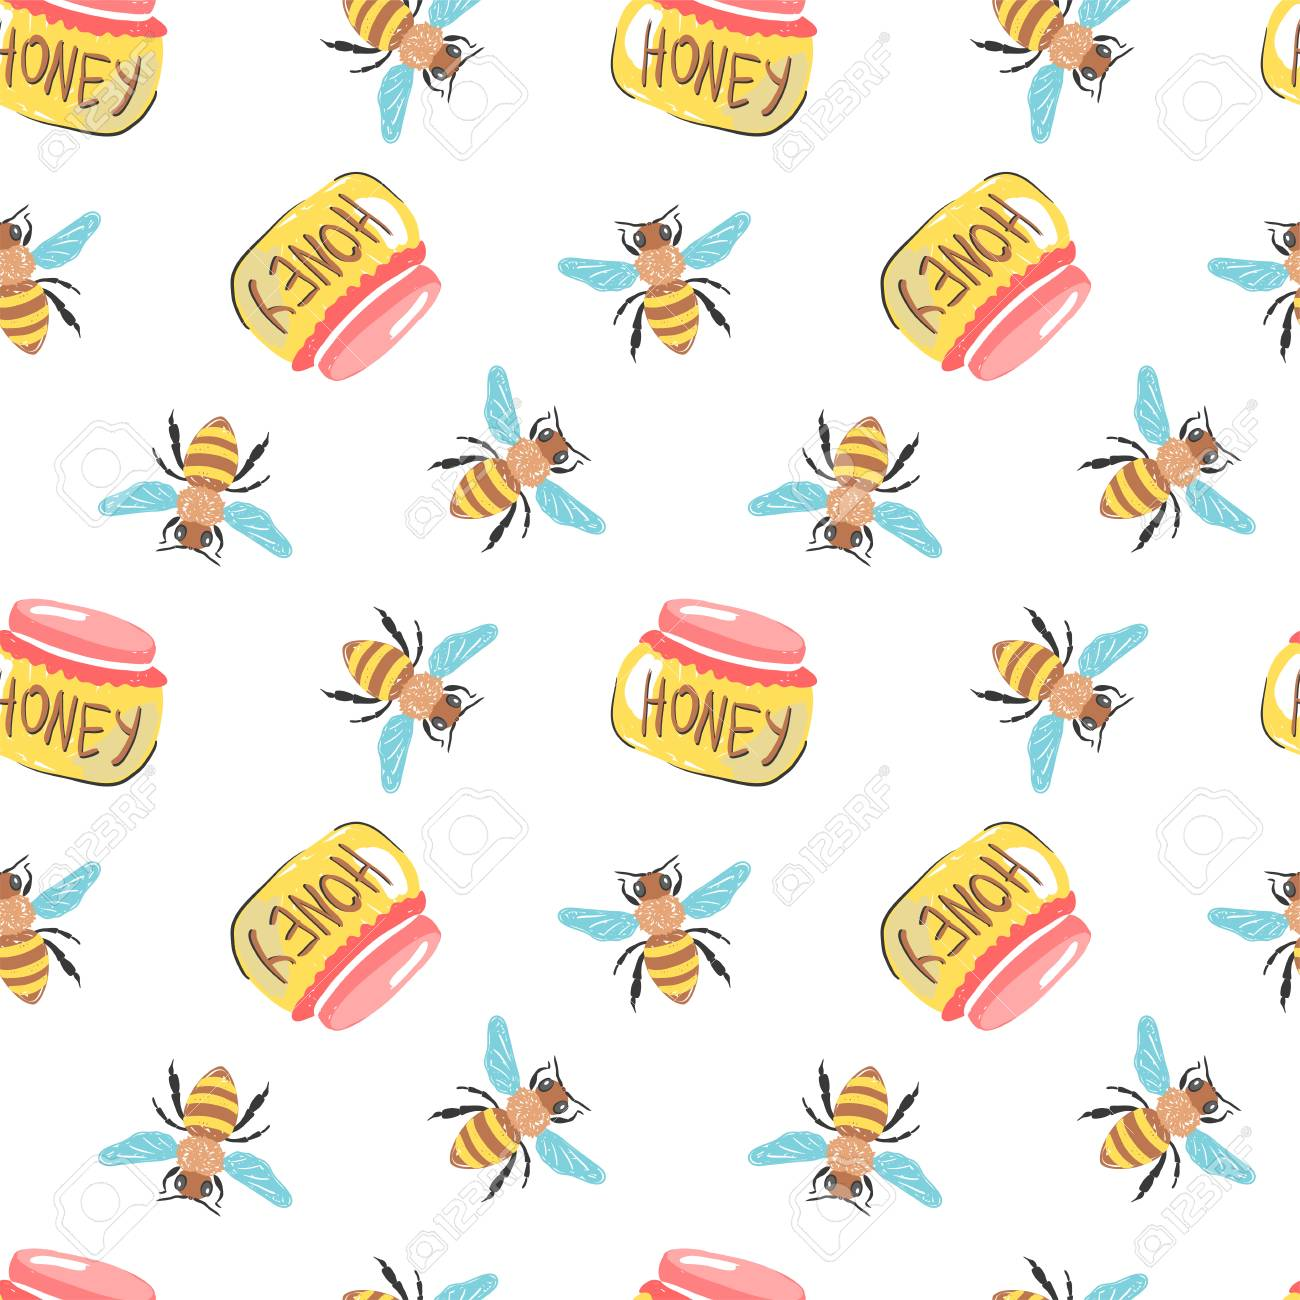 Honey Simple Sketh Drawn By Hand Seamless Pattern In Cartoon